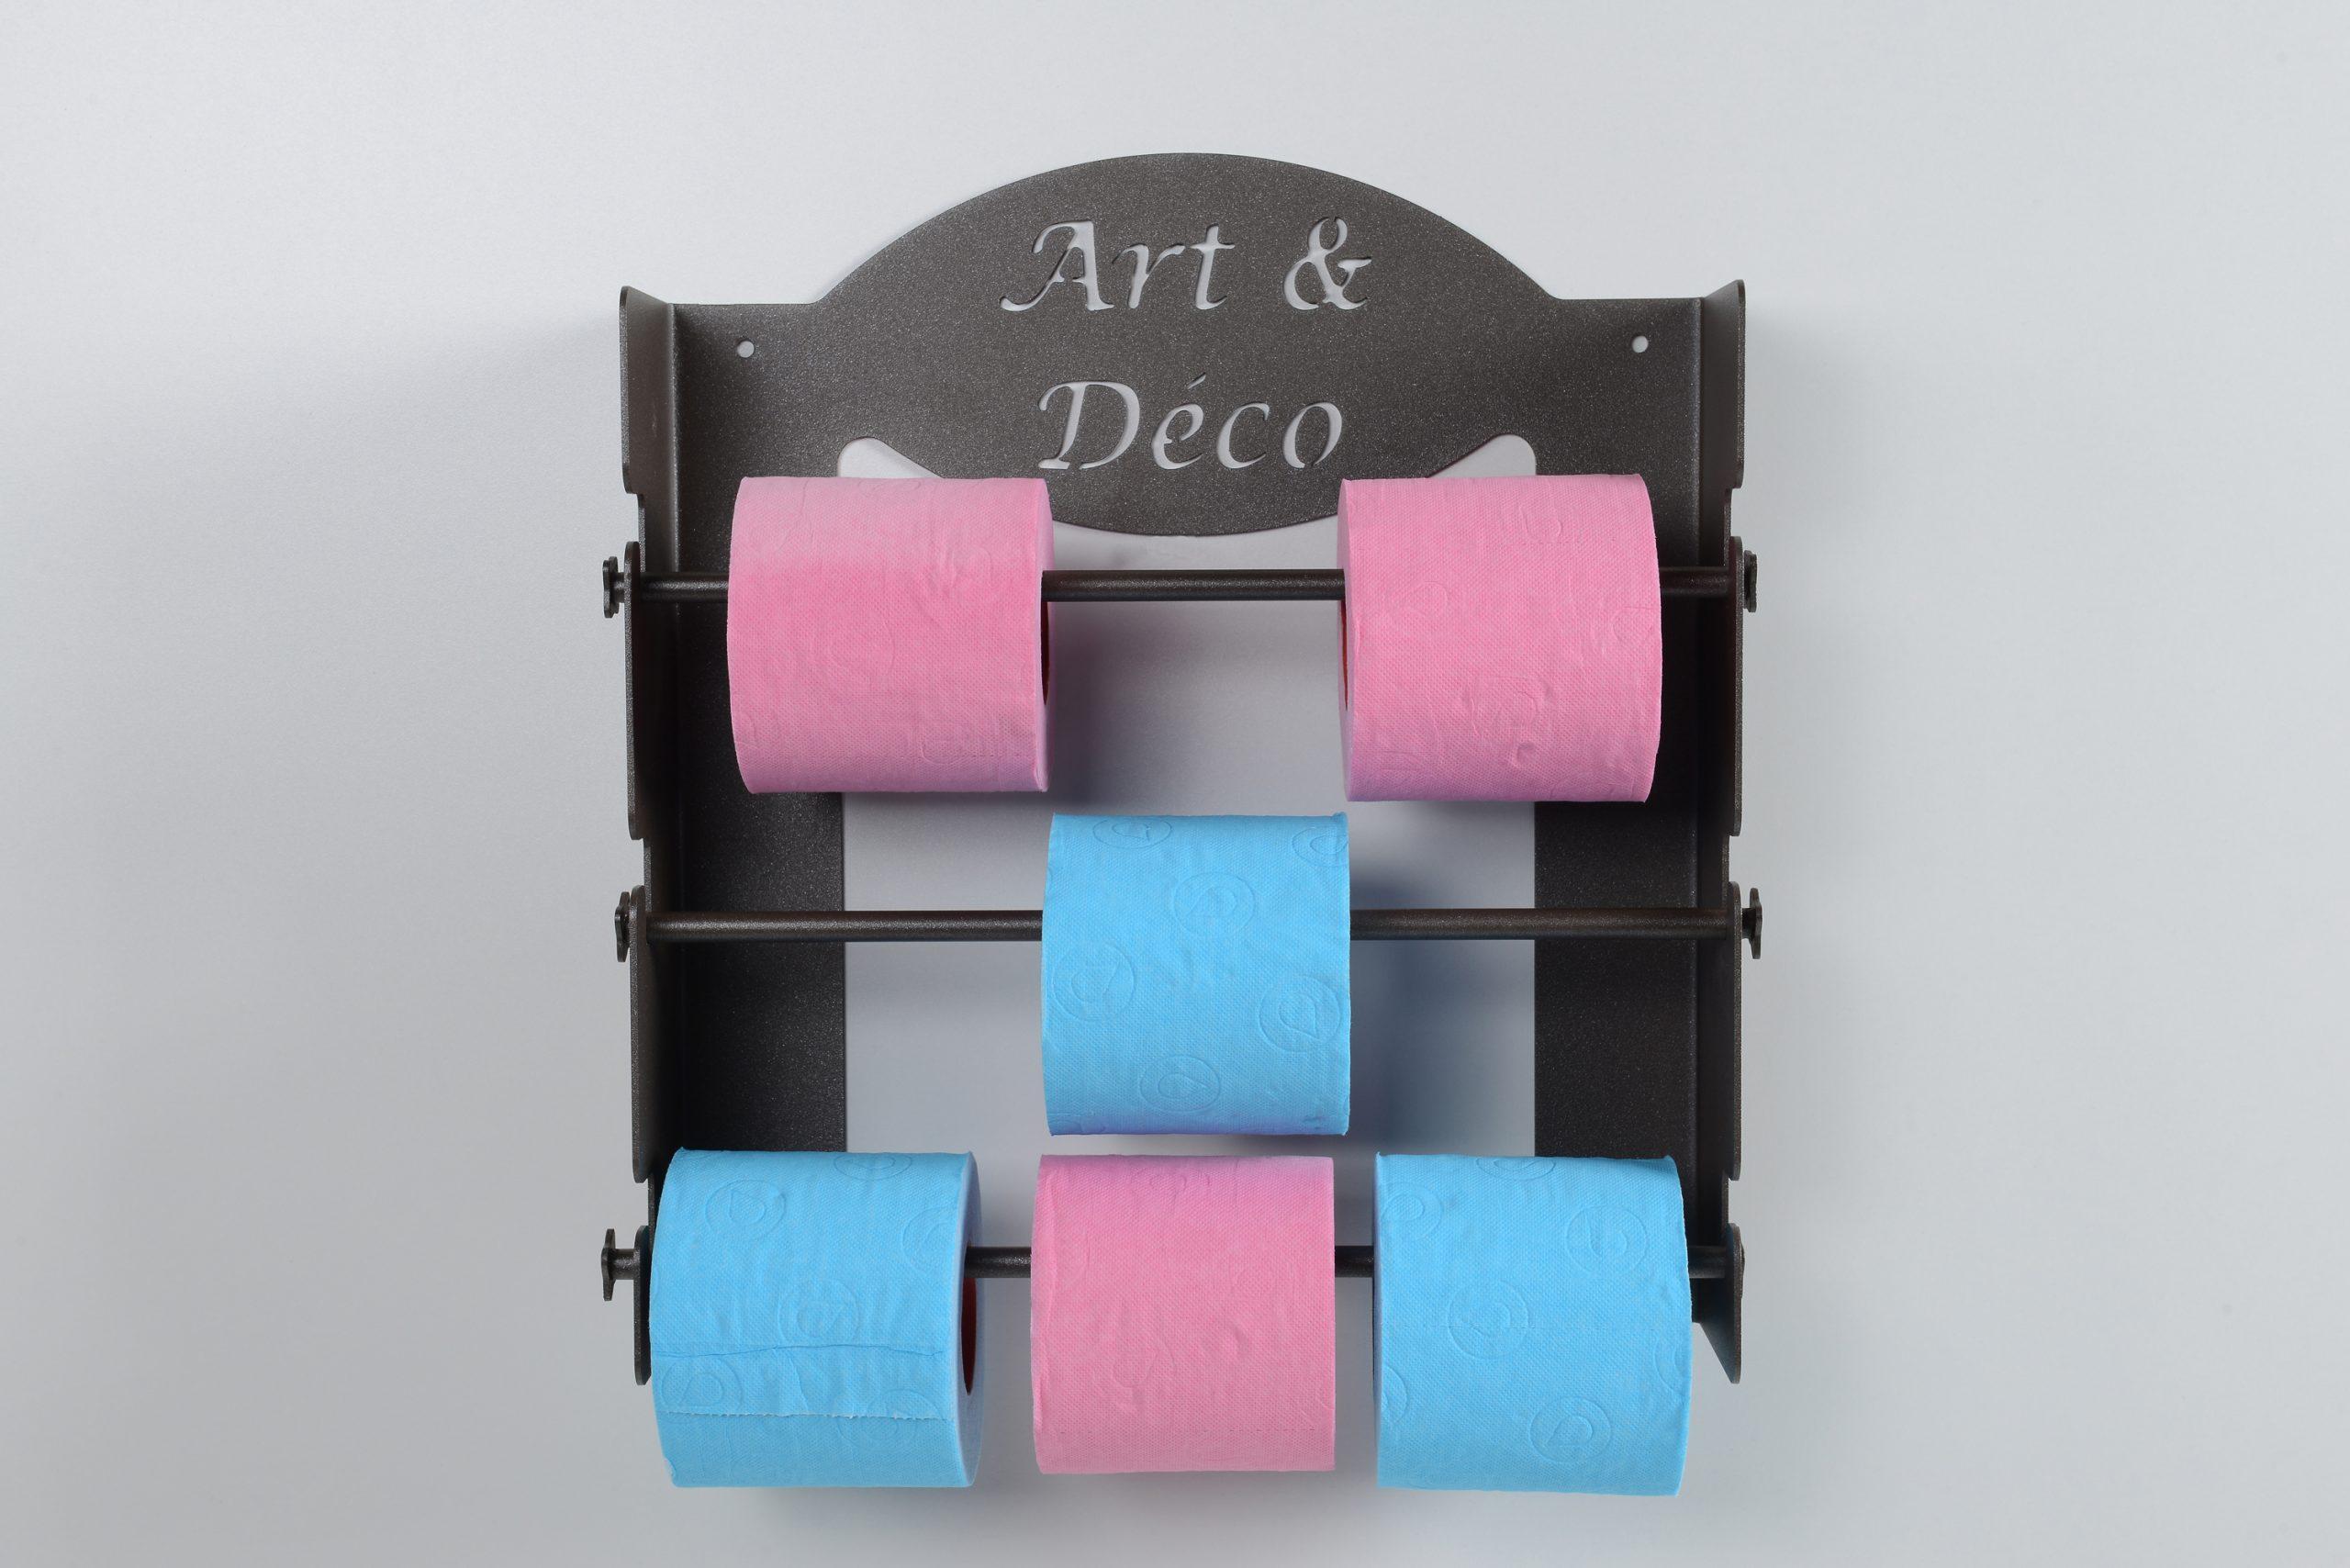 Kit de rangement mural multifonctions ART & DECO